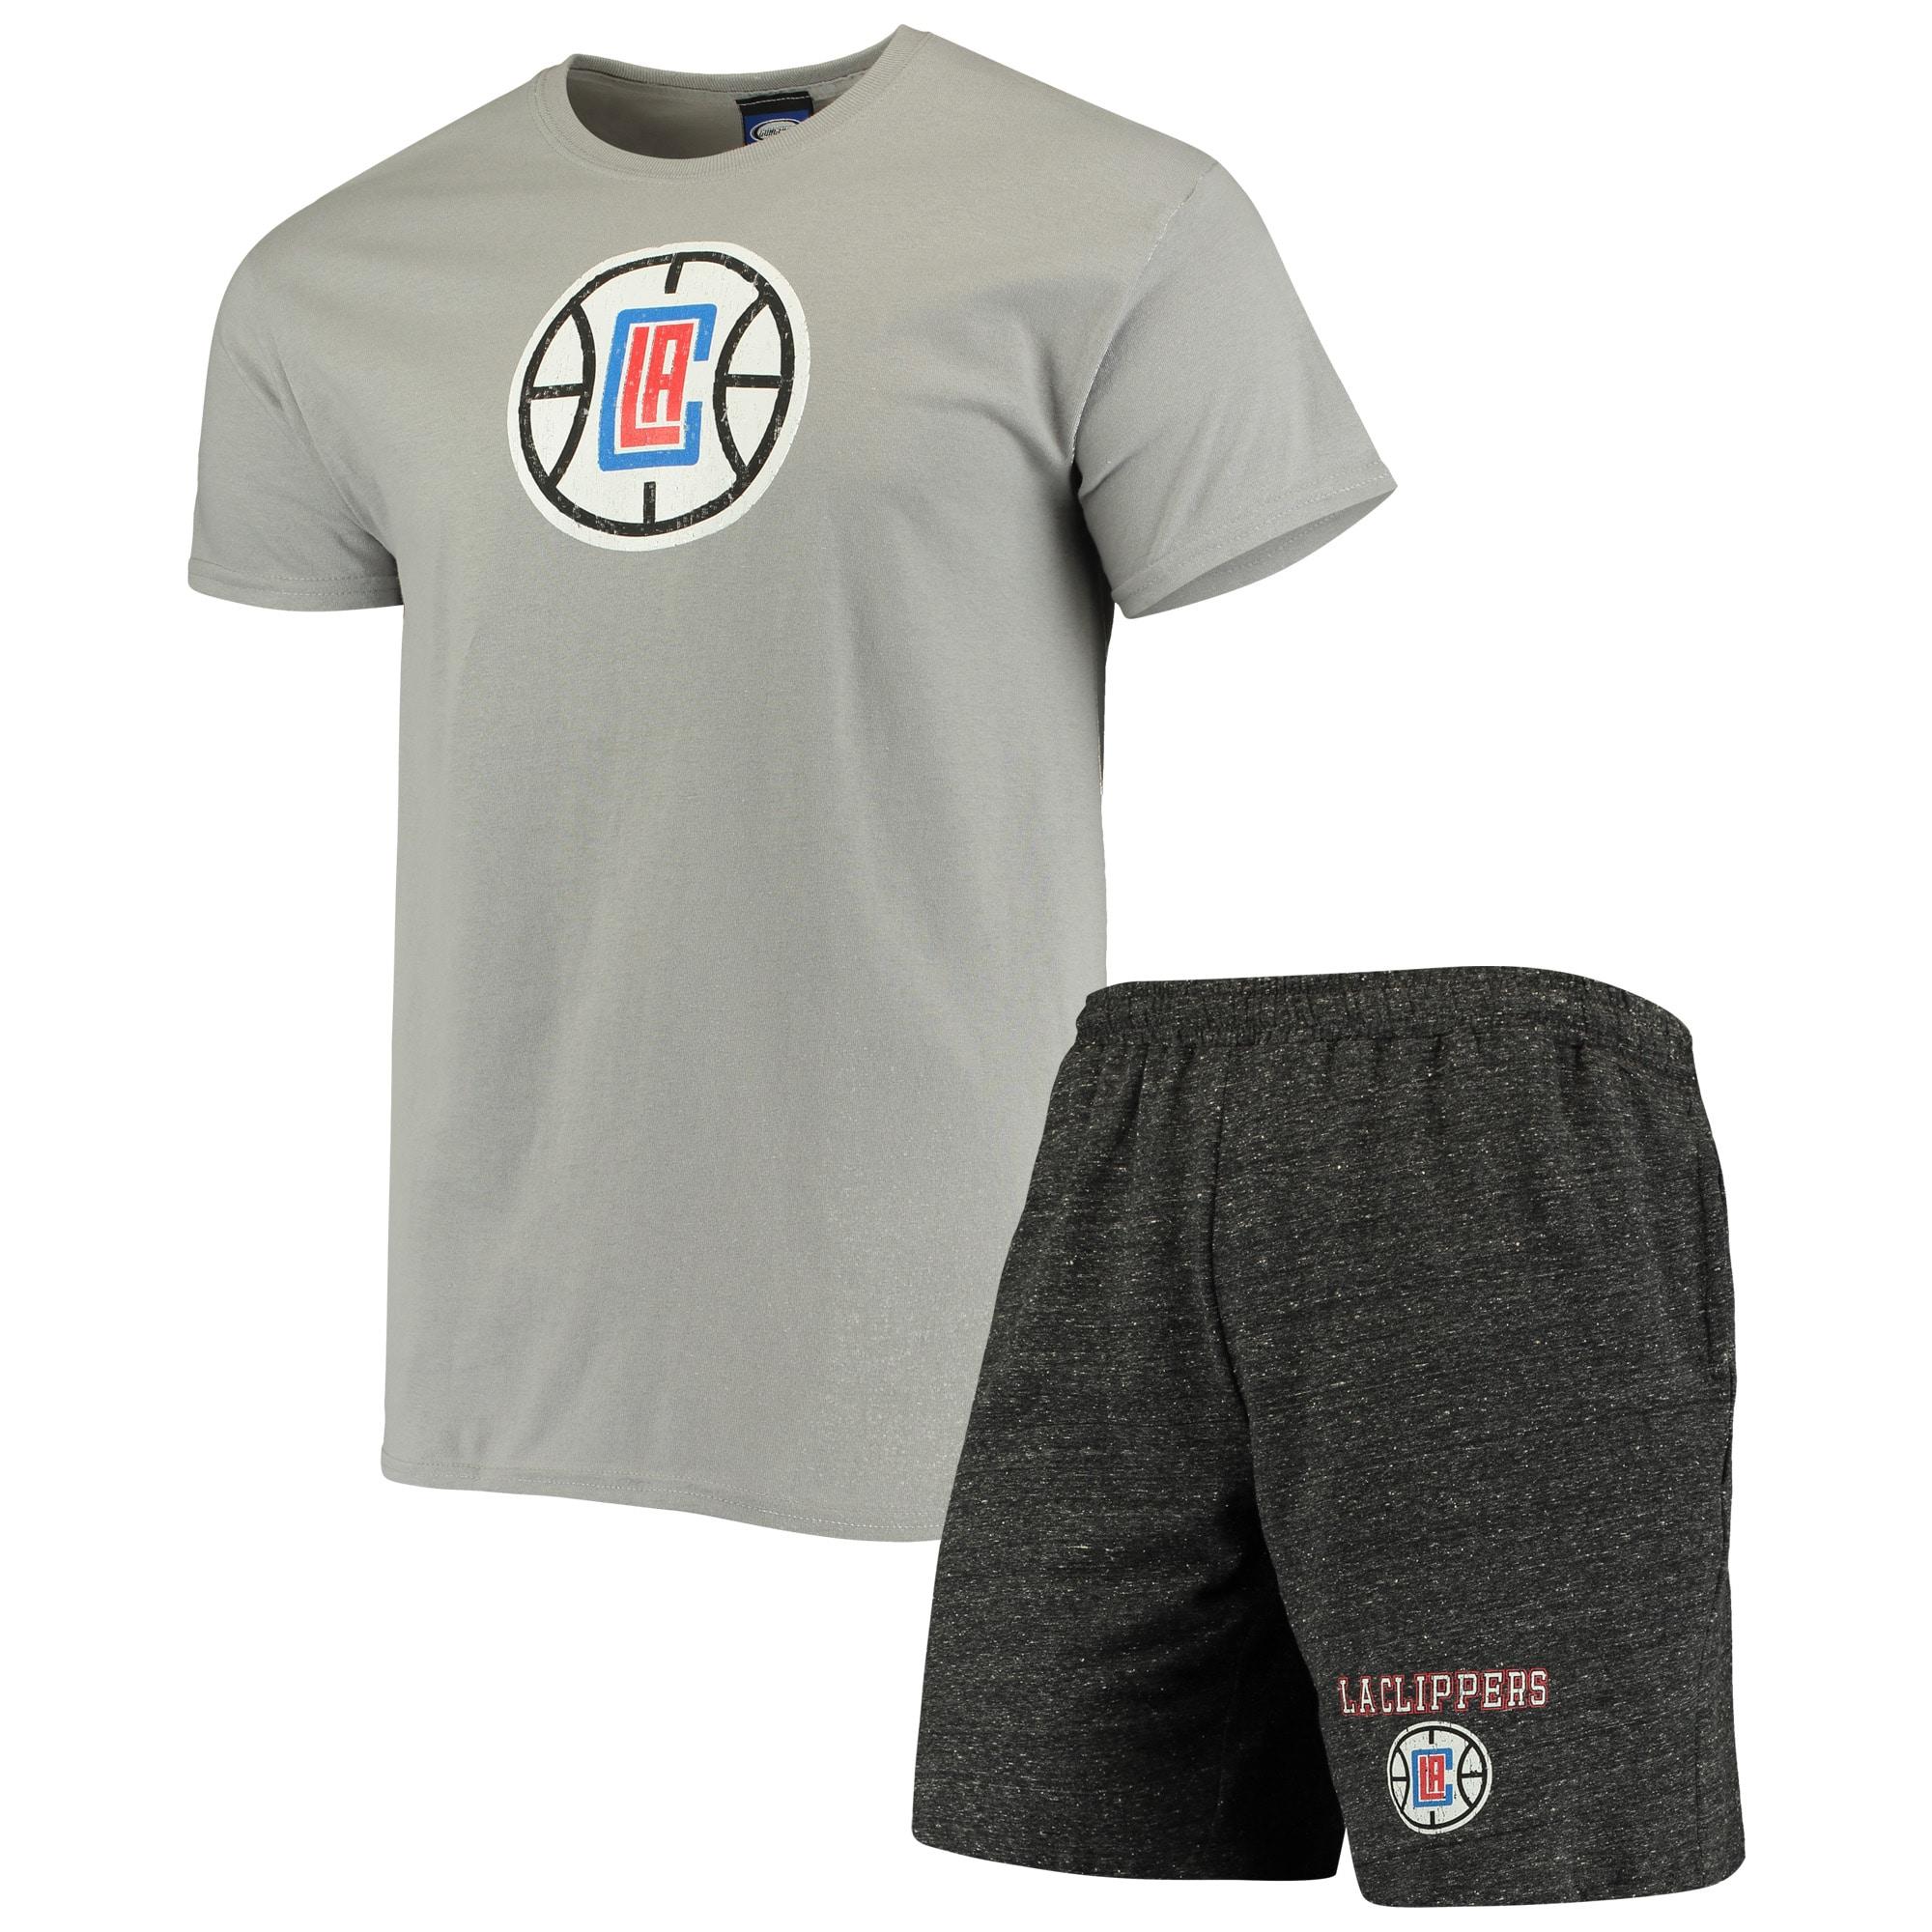 LA Clippers Concepts Sport Pitch T-Shirt & Shorts Set - Gray/Charcoal